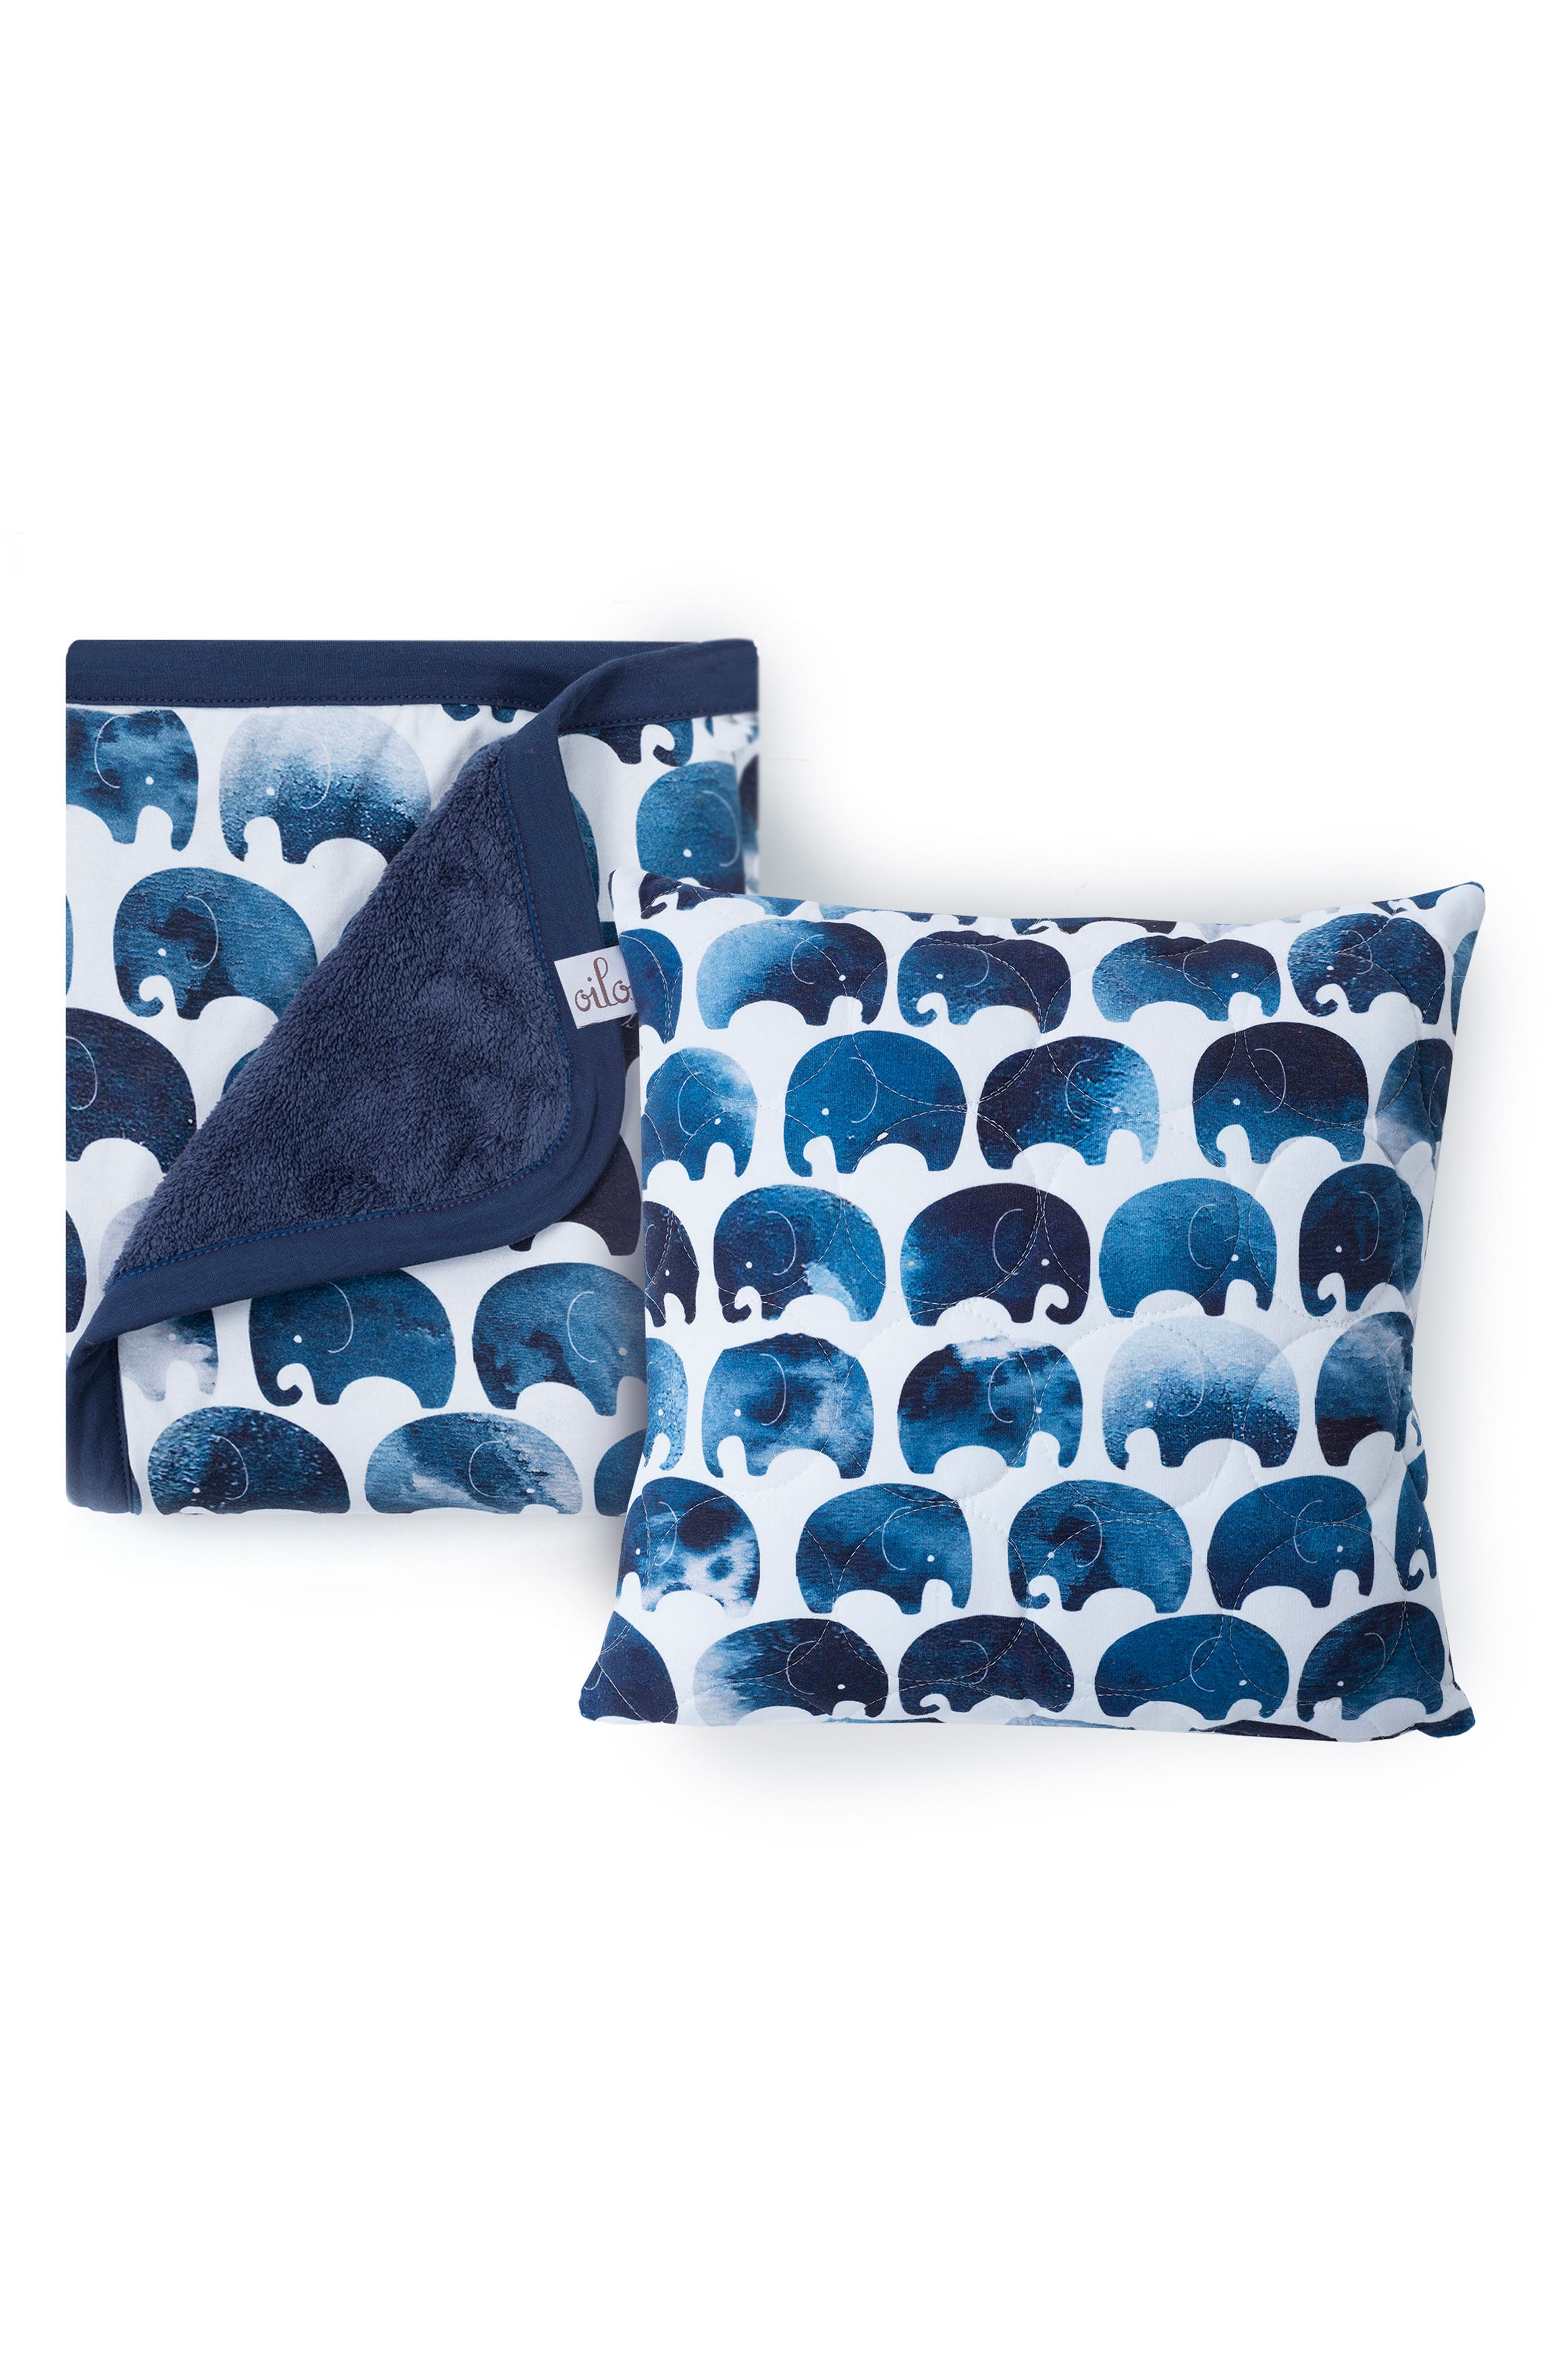 Elefant Blanket & Pillow Set,                         Main,                         color, ELEFANT